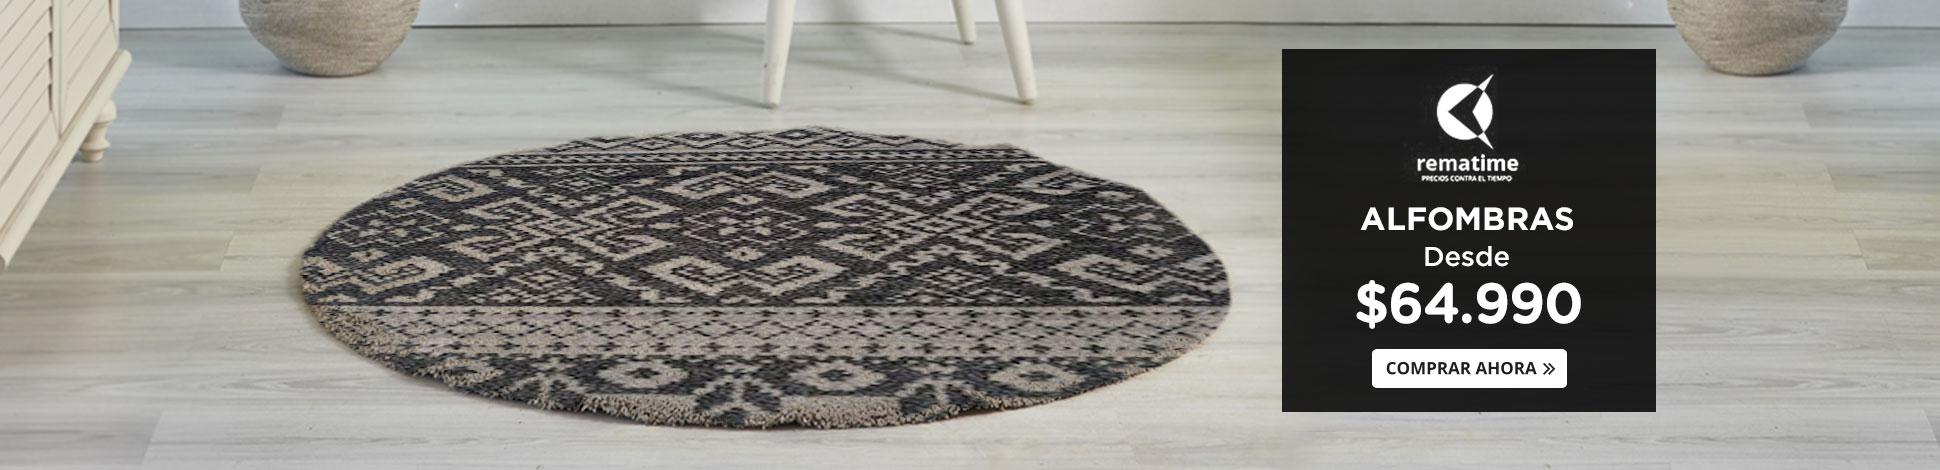 hs-alfombras.jpg